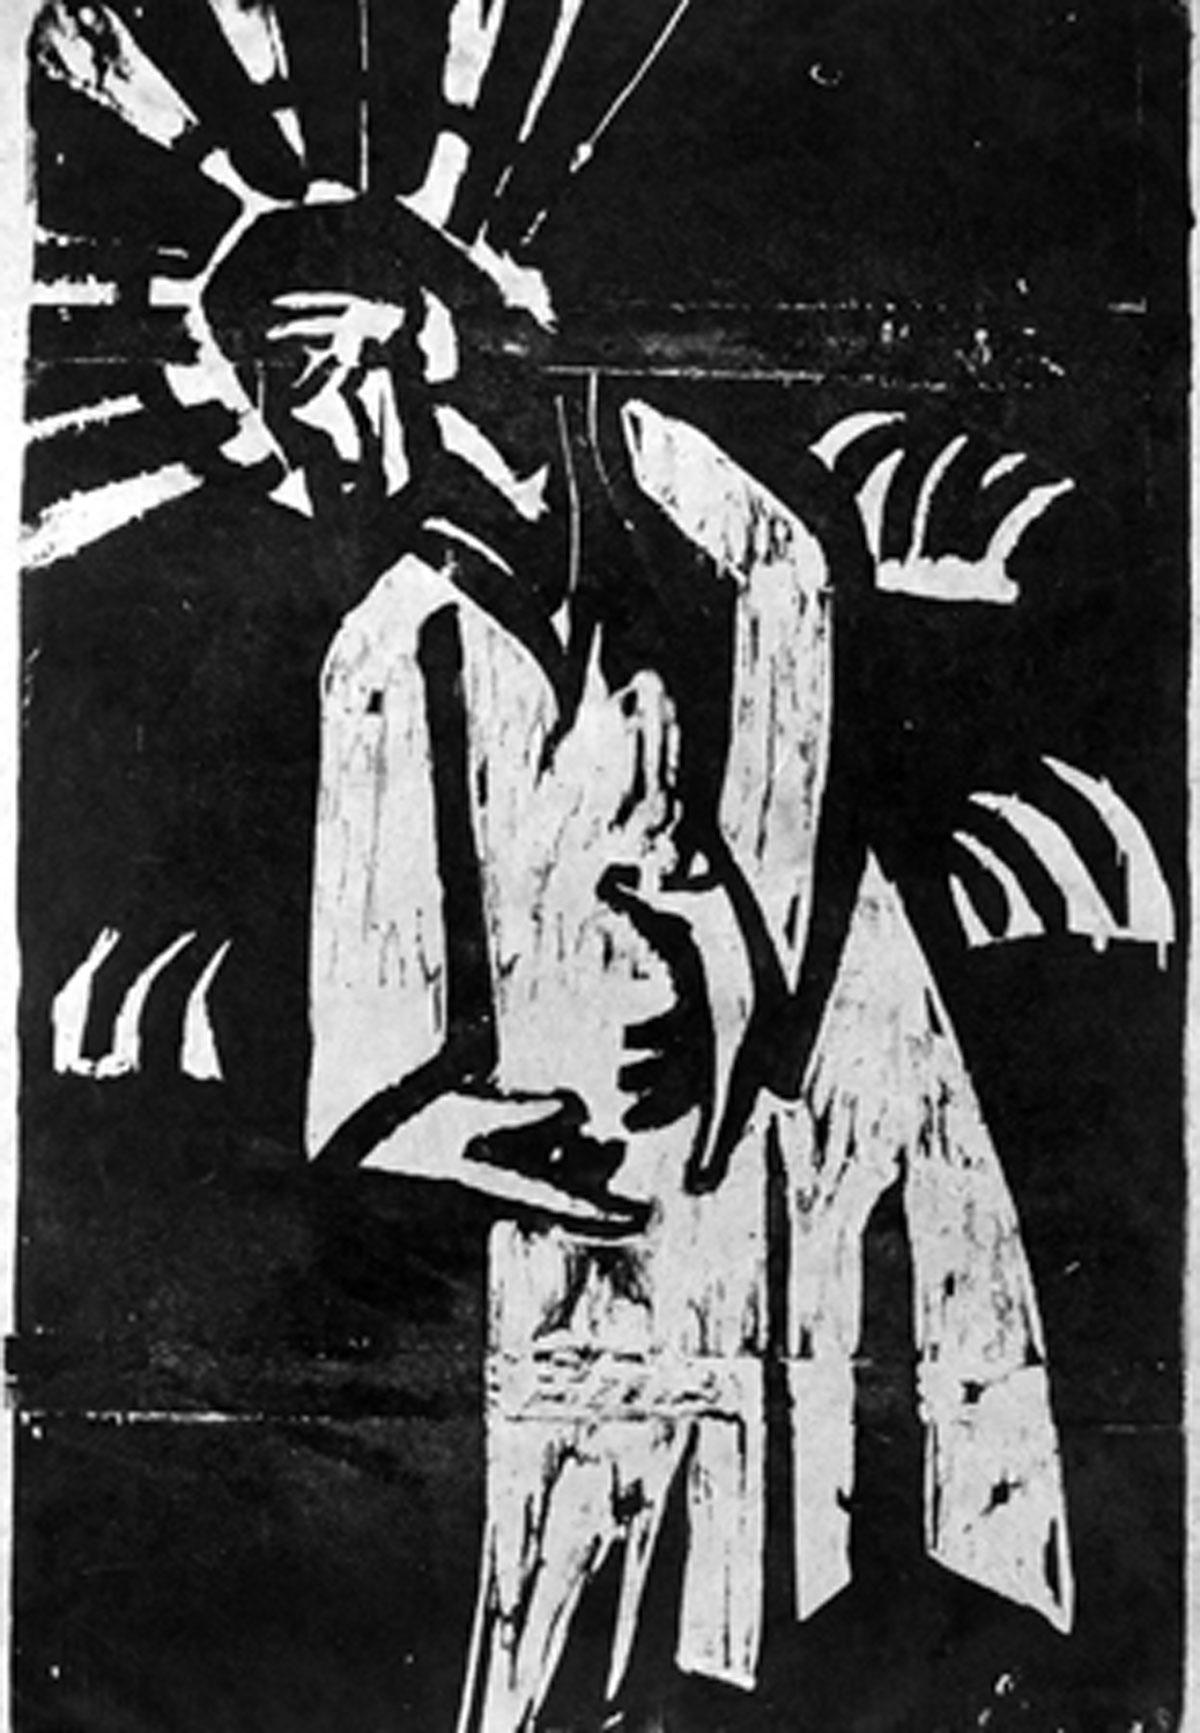 Heinz Tetzner, Vision, 1956